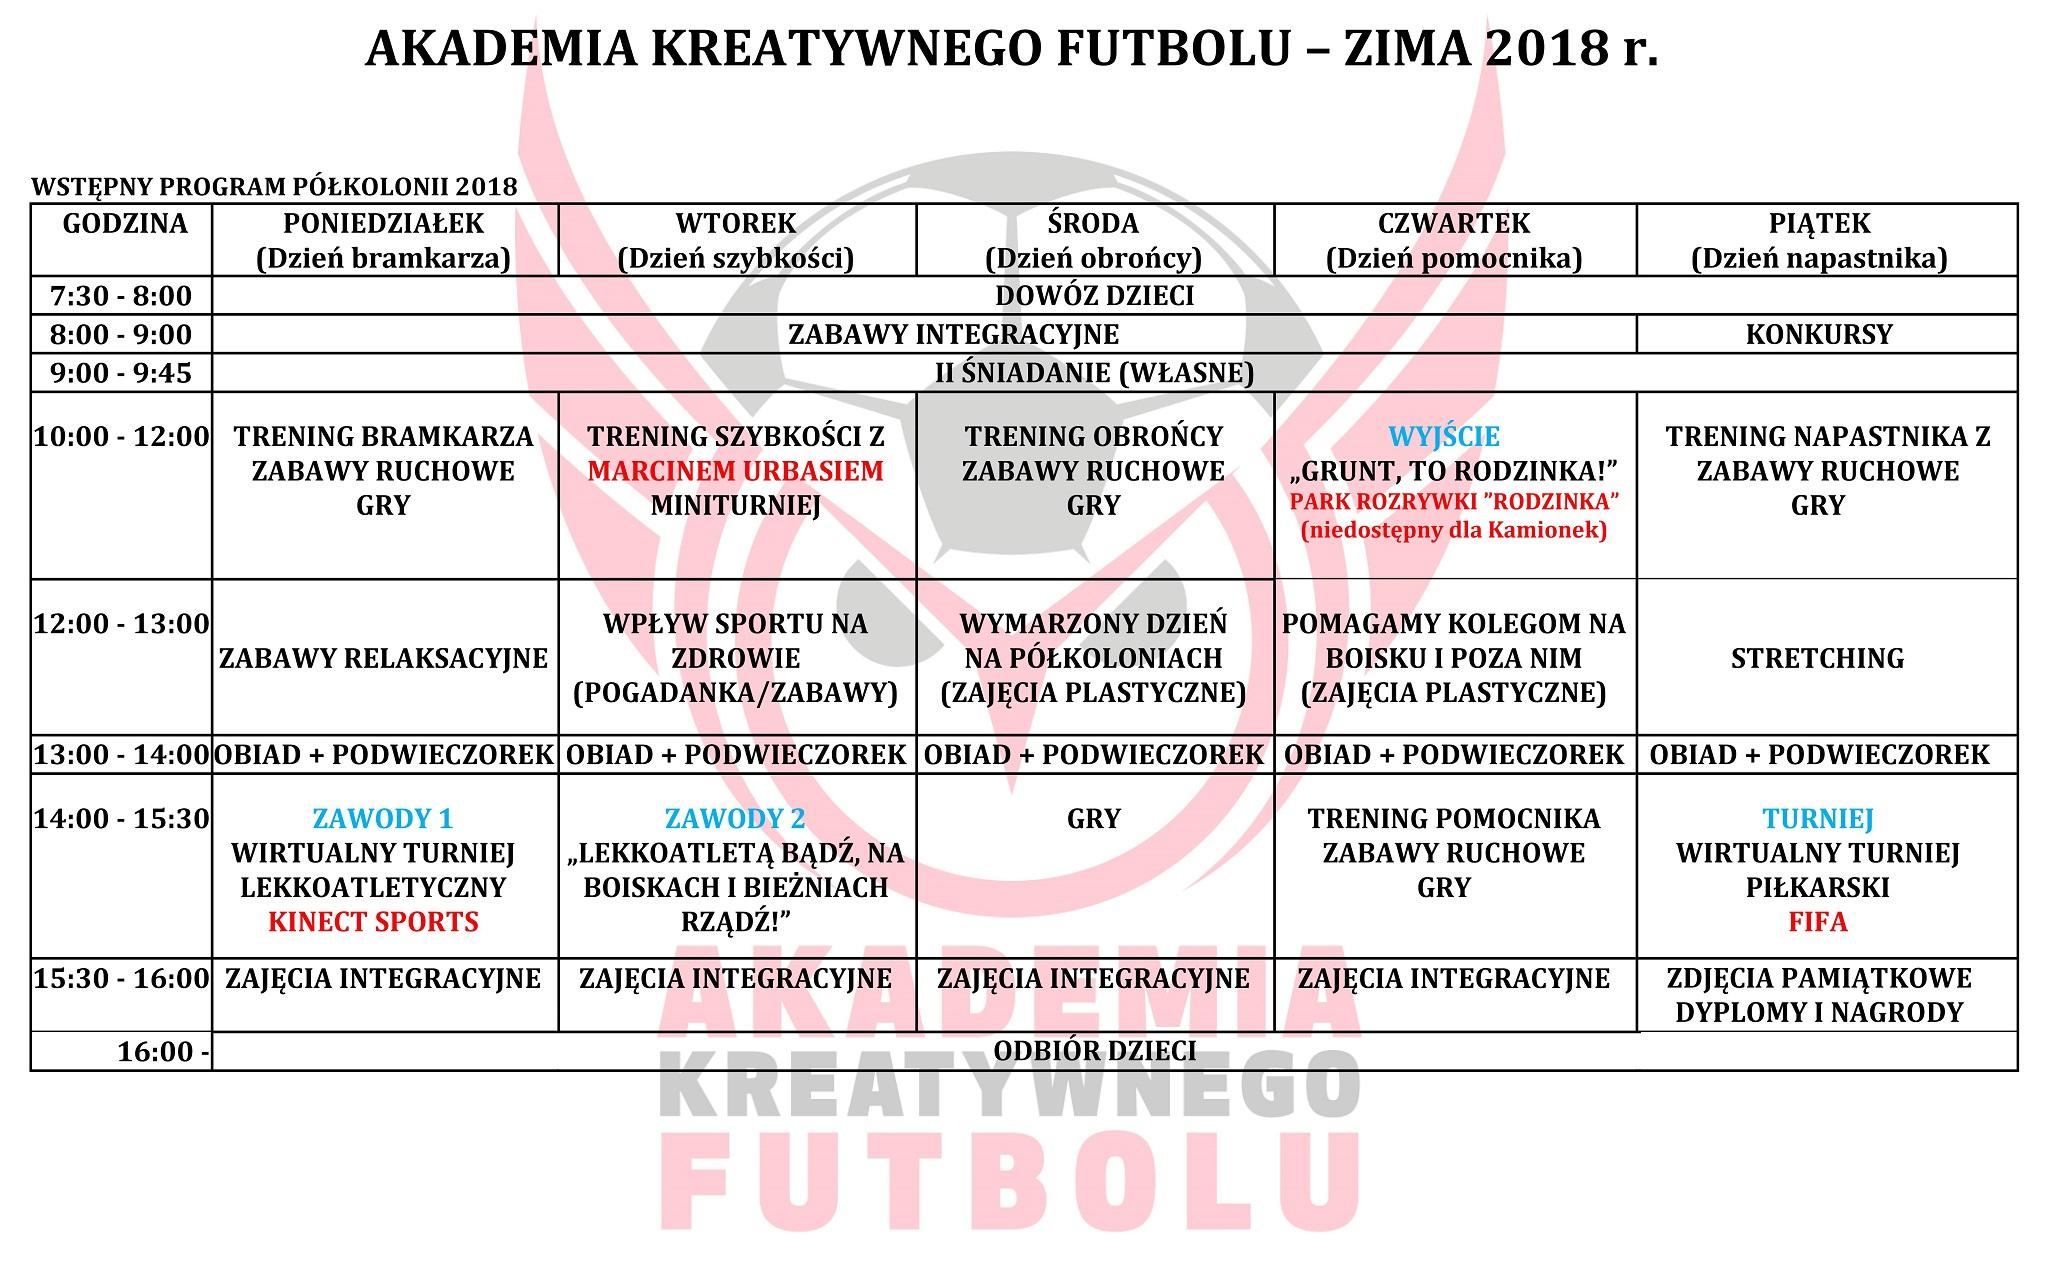 ZIMA 2018 - Program polkolonii (1 turnus)